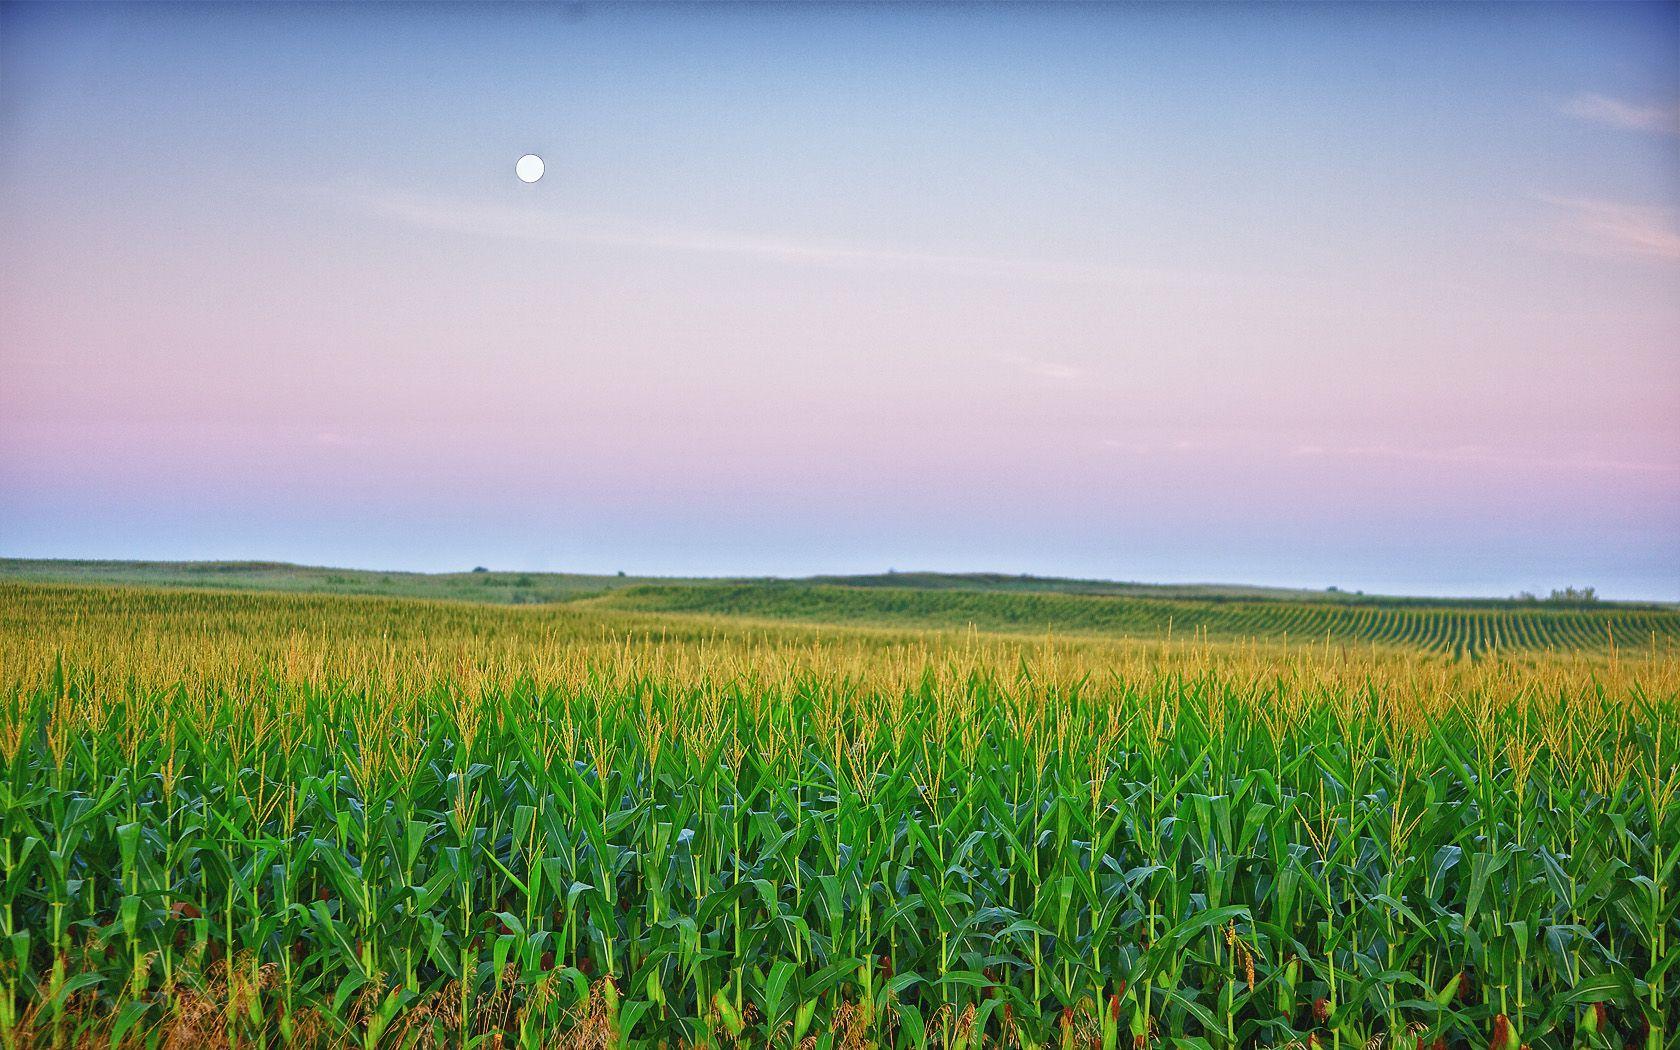 Iowa Scenery Wallpapers   Top Iowa Scenery Backgrounds 1680x1050